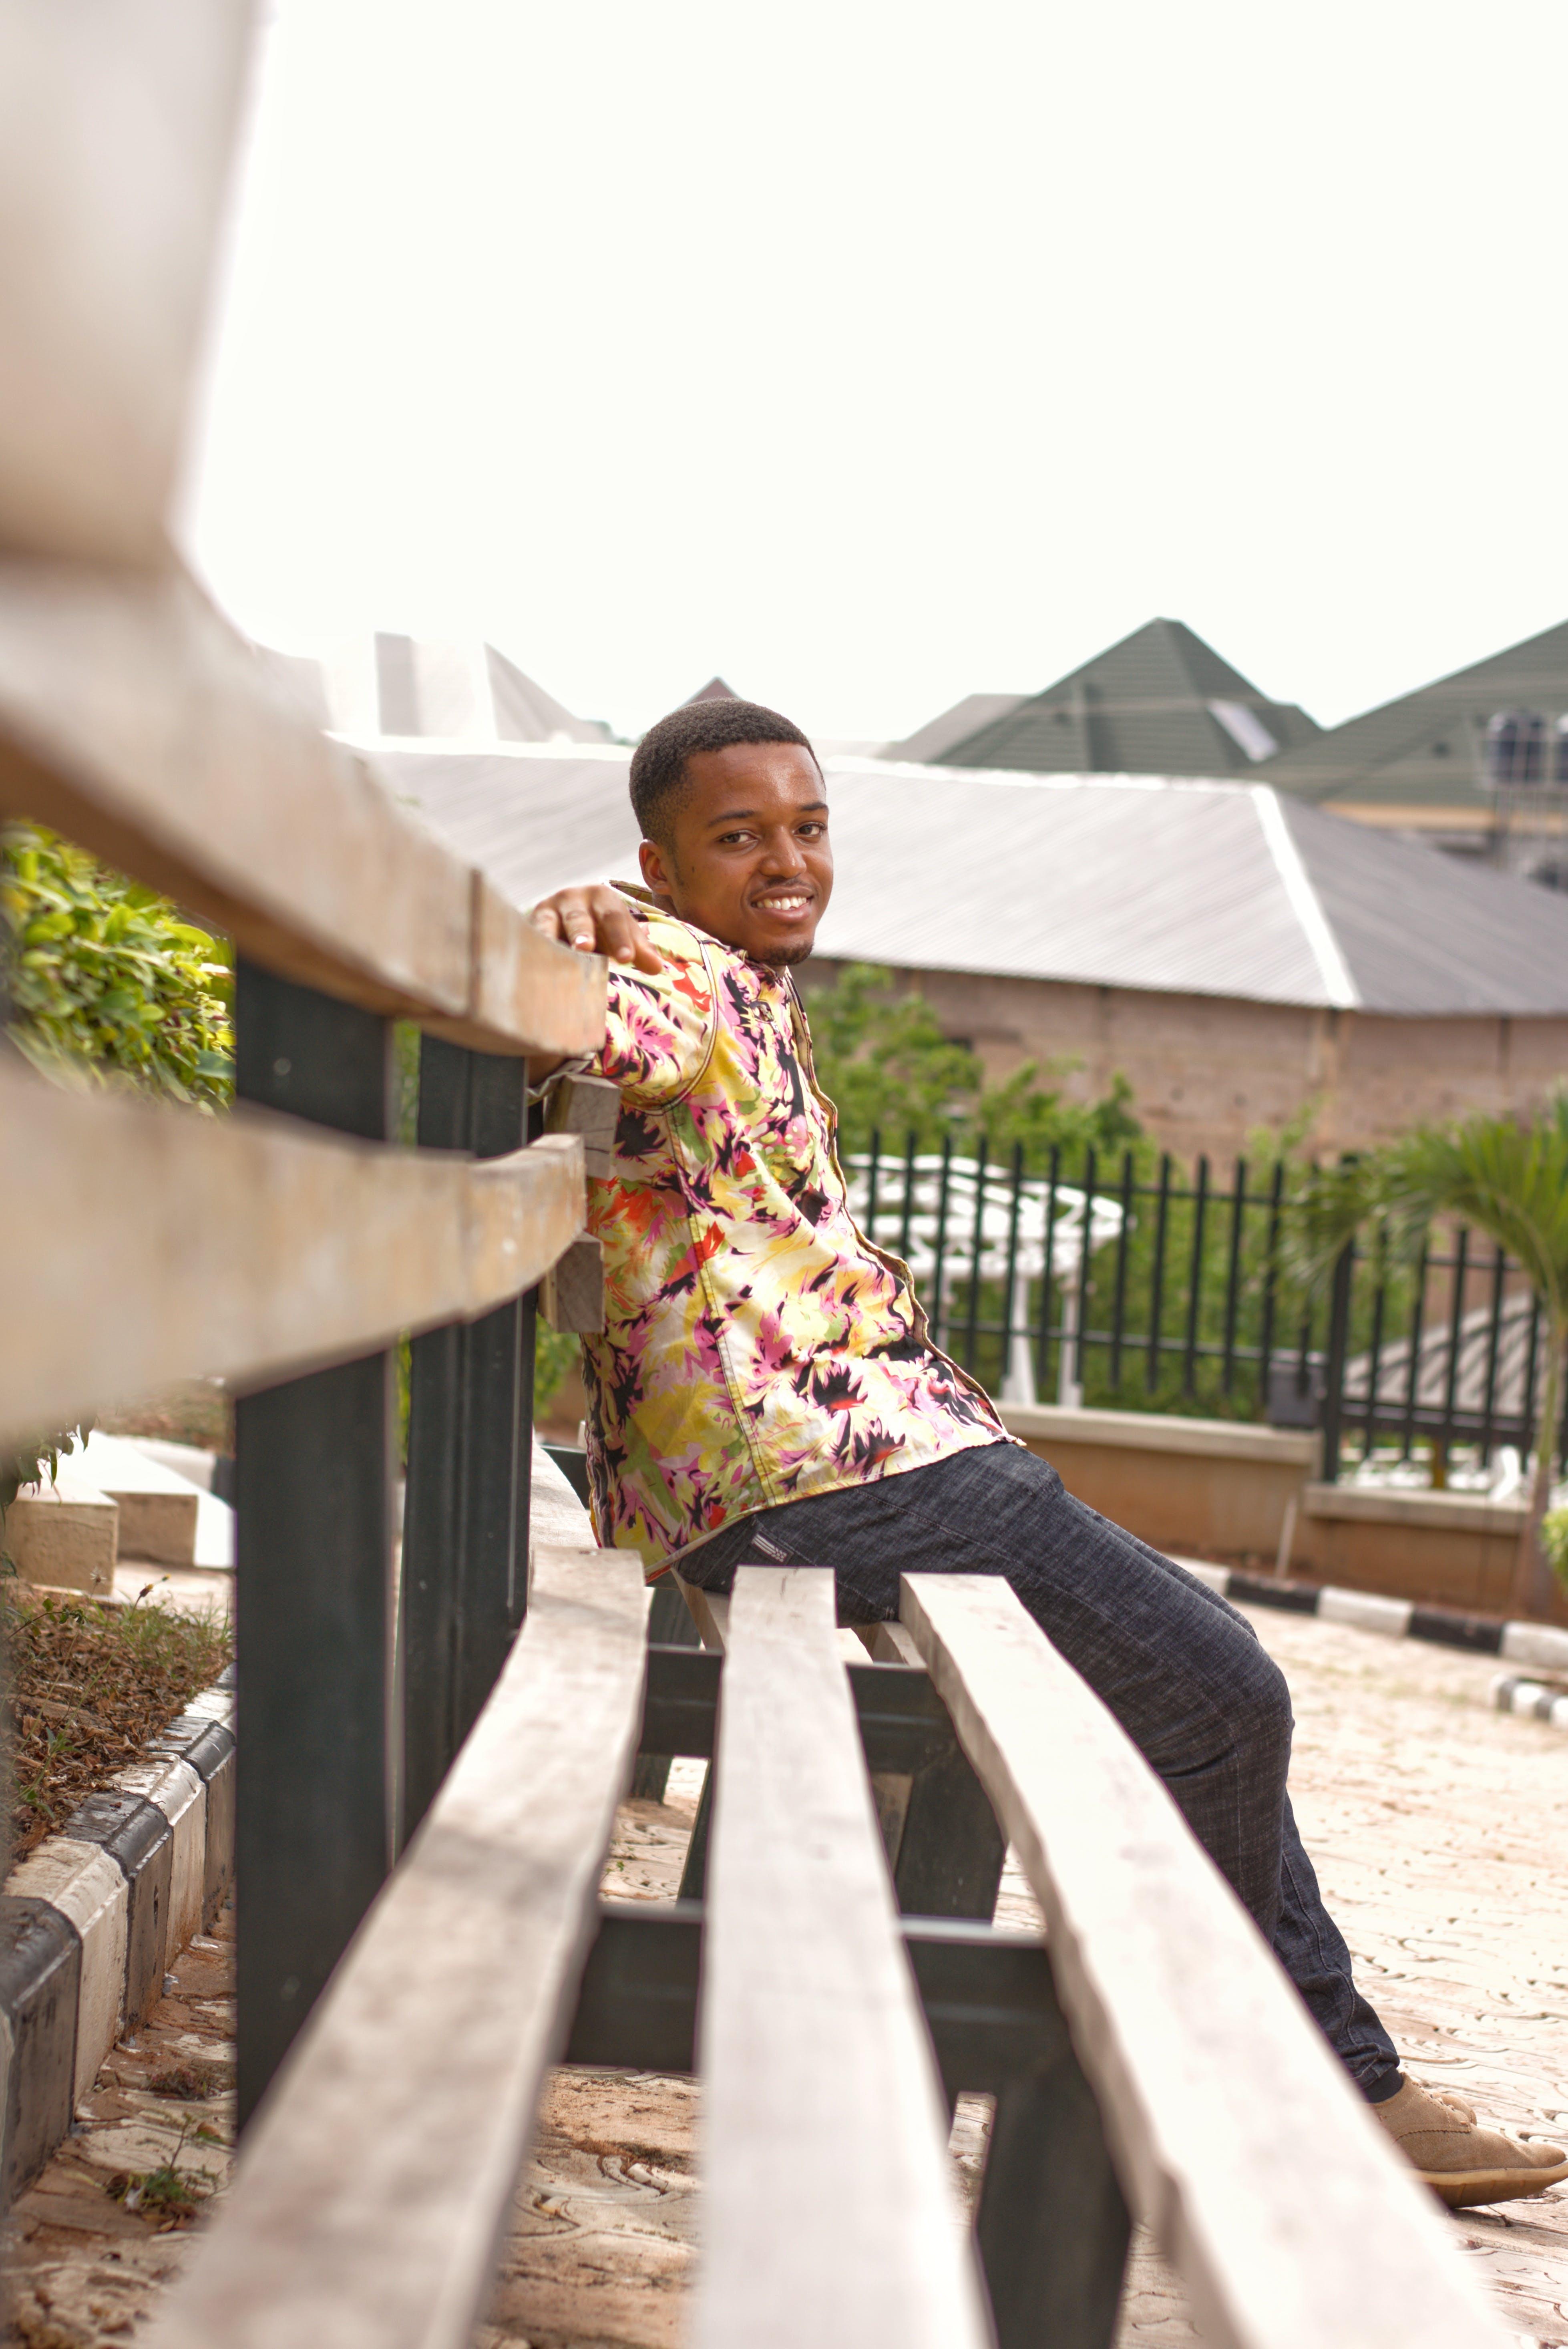 Безкоштовне стокове фото на тему «Африканський чоловік, вираз обличчя, дерев'яна лавка, людина»